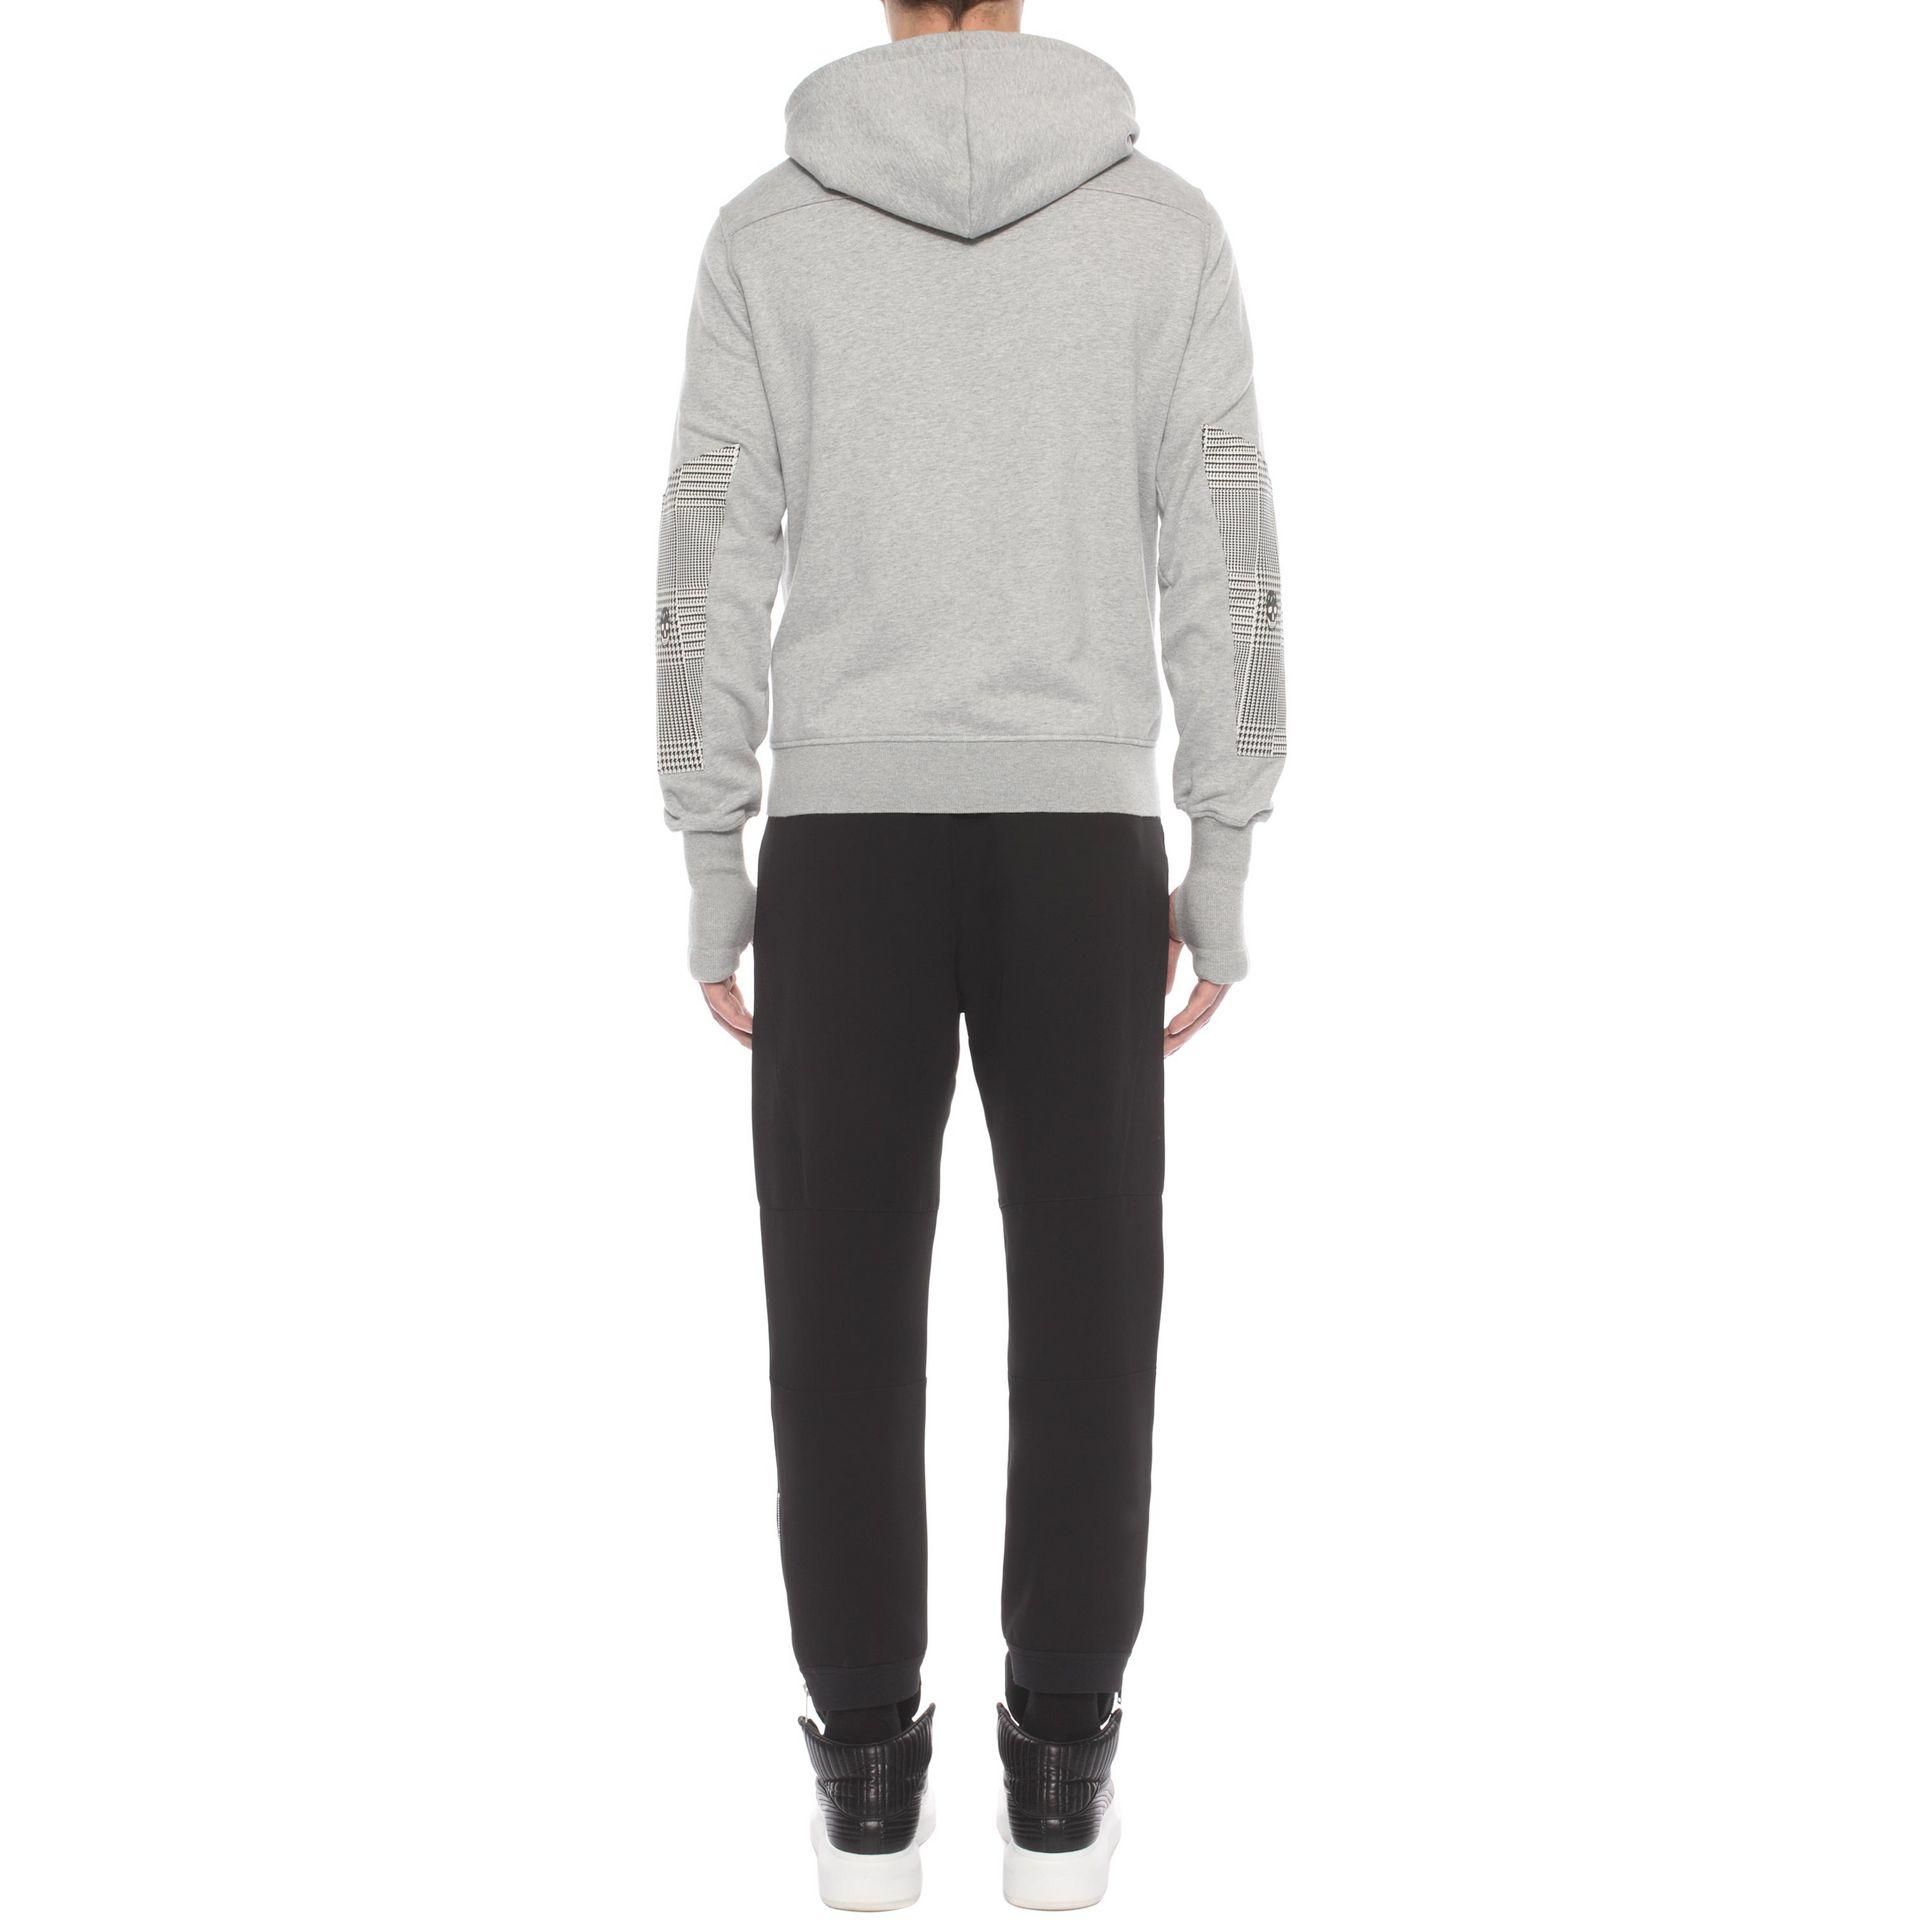 lyst alexander mcqueen printed cotton sweatshirt grey in gray for men. Black Bedroom Furniture Sets. Home Design Ideas